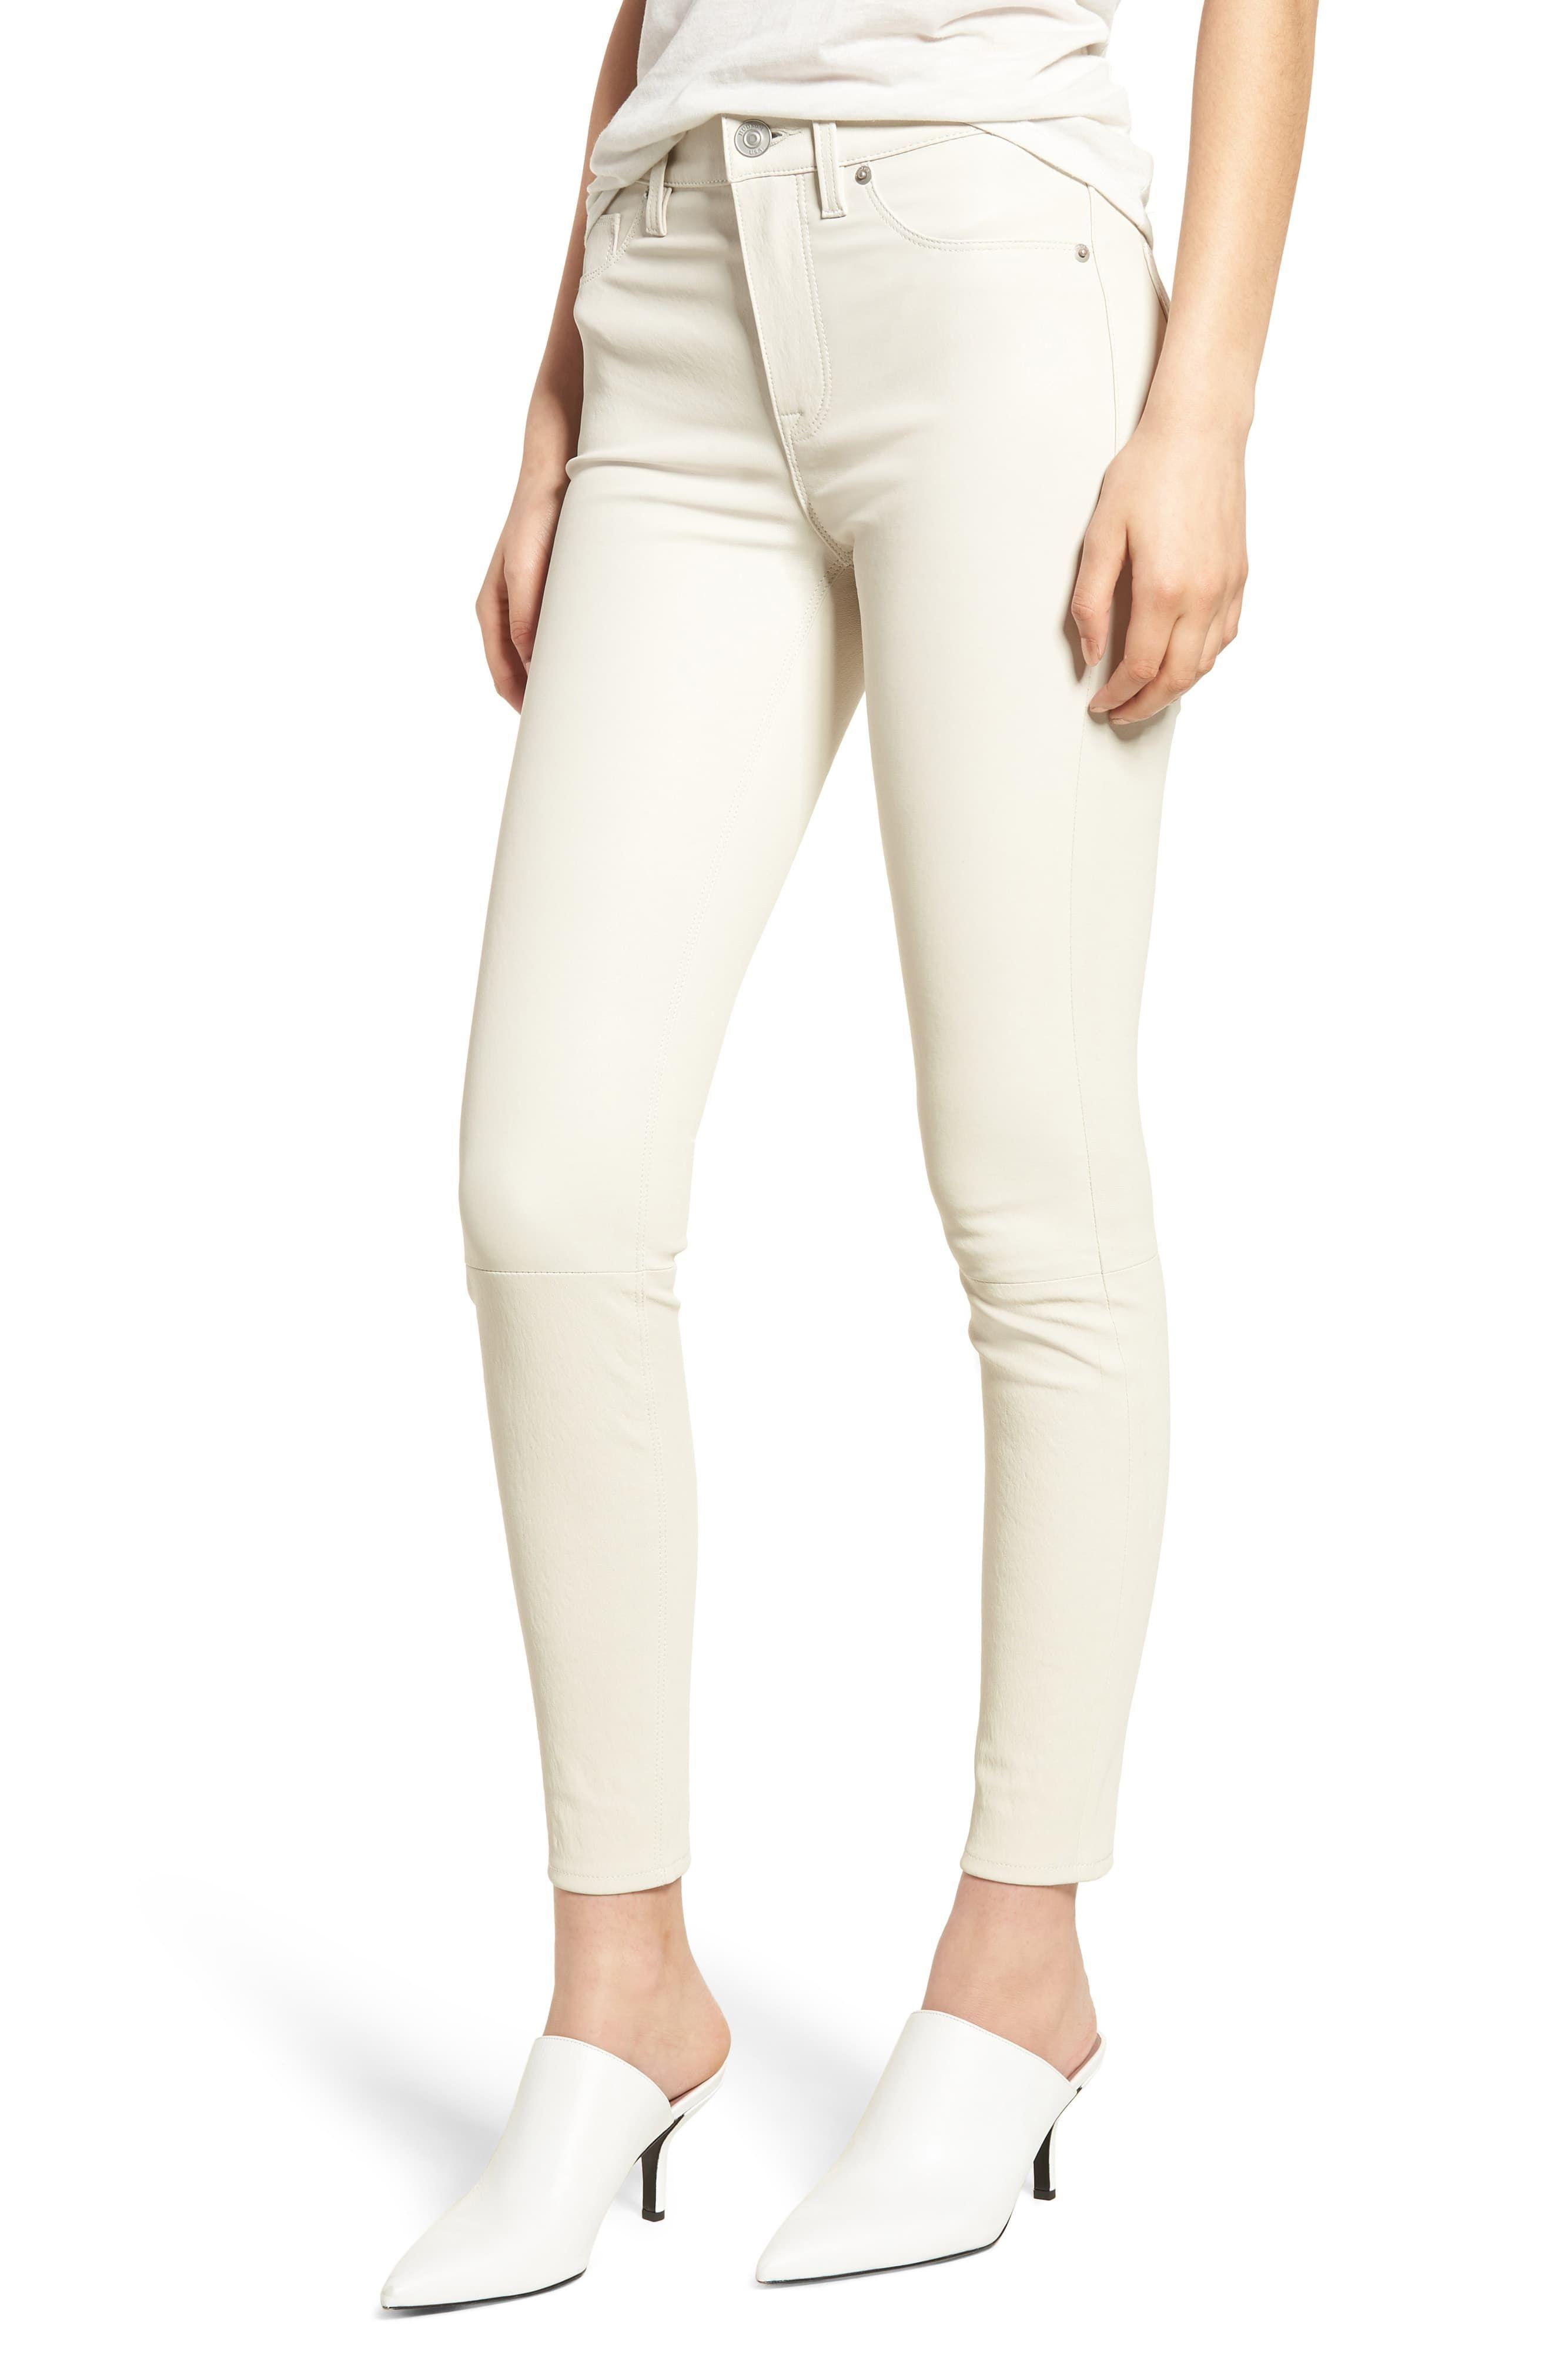 cb85b844e3b Women's Hudson Jeans Barbara High Waist Super Skinny Leather Jeans, Size 27  - White